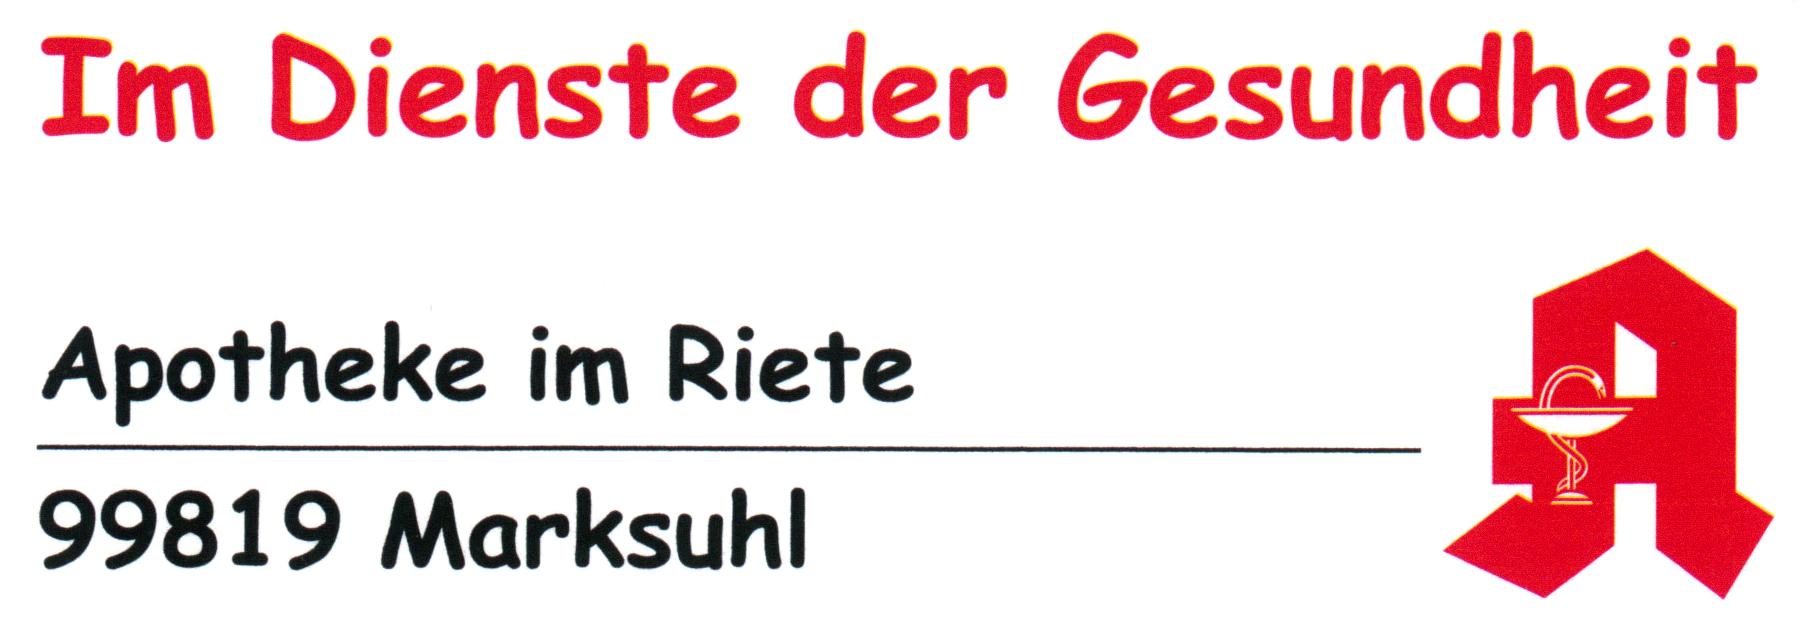 Logo der Apotheke im Riete